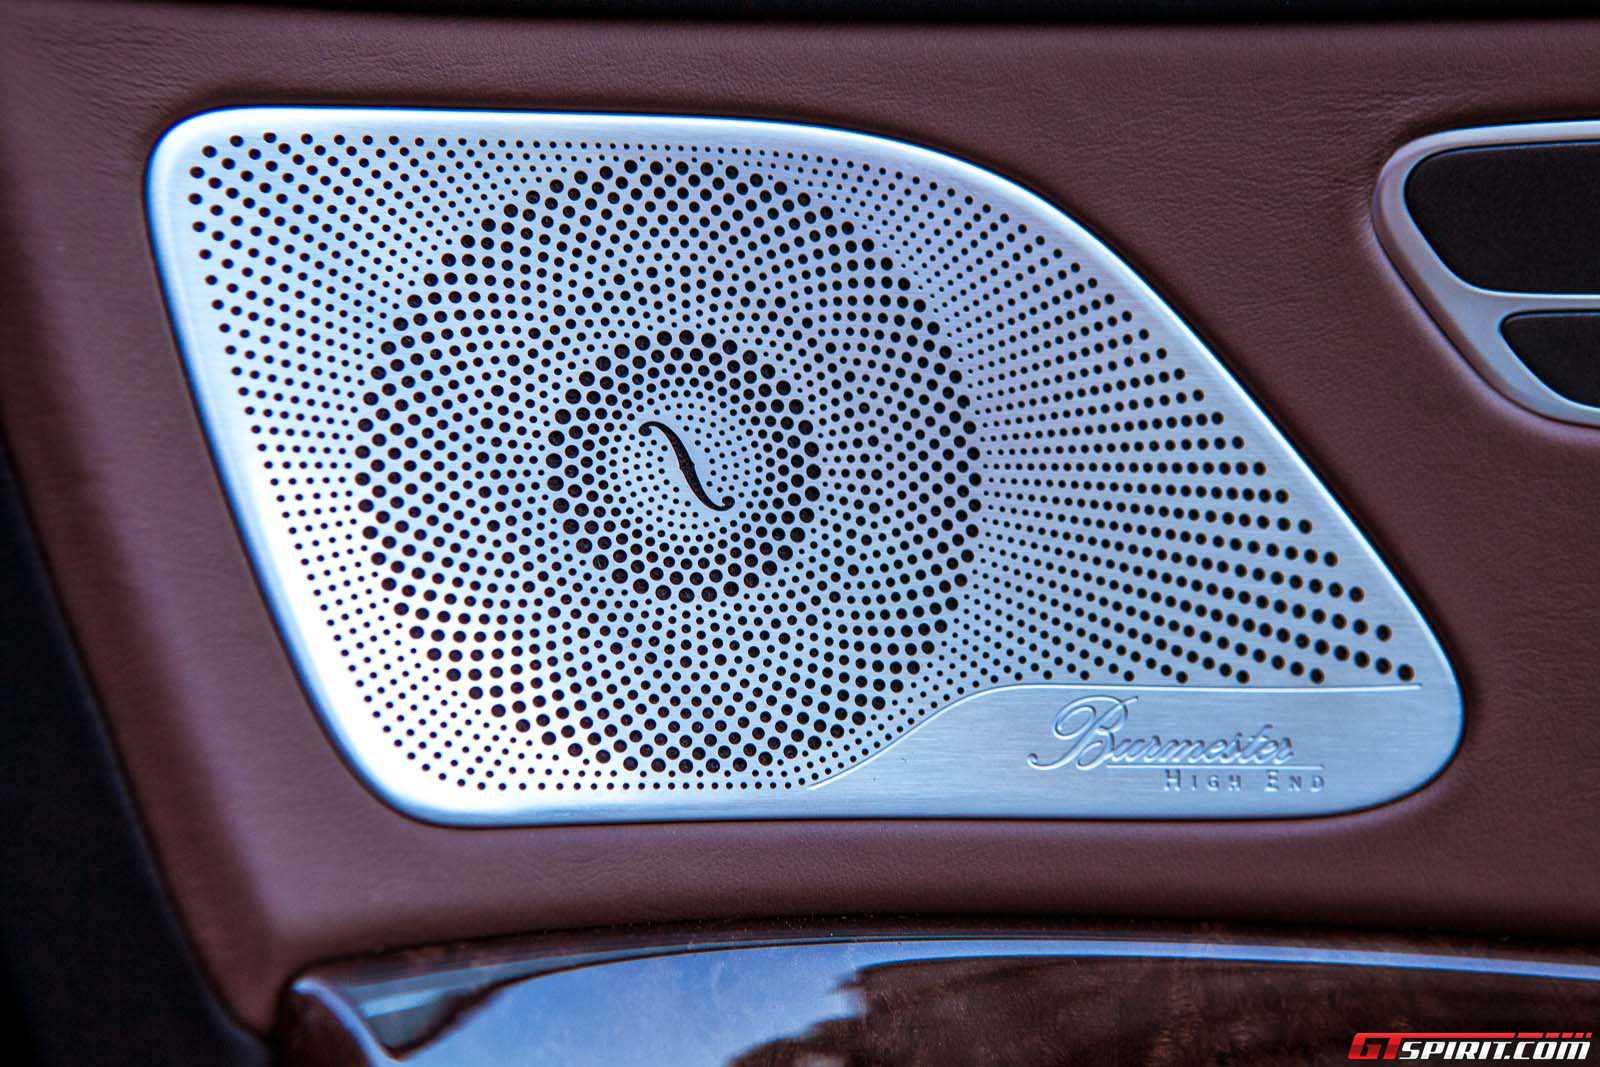 2015 mercedes benz s65 amg review gtspirit. Black Bedroom Furniture Sets. Home Design Ideas